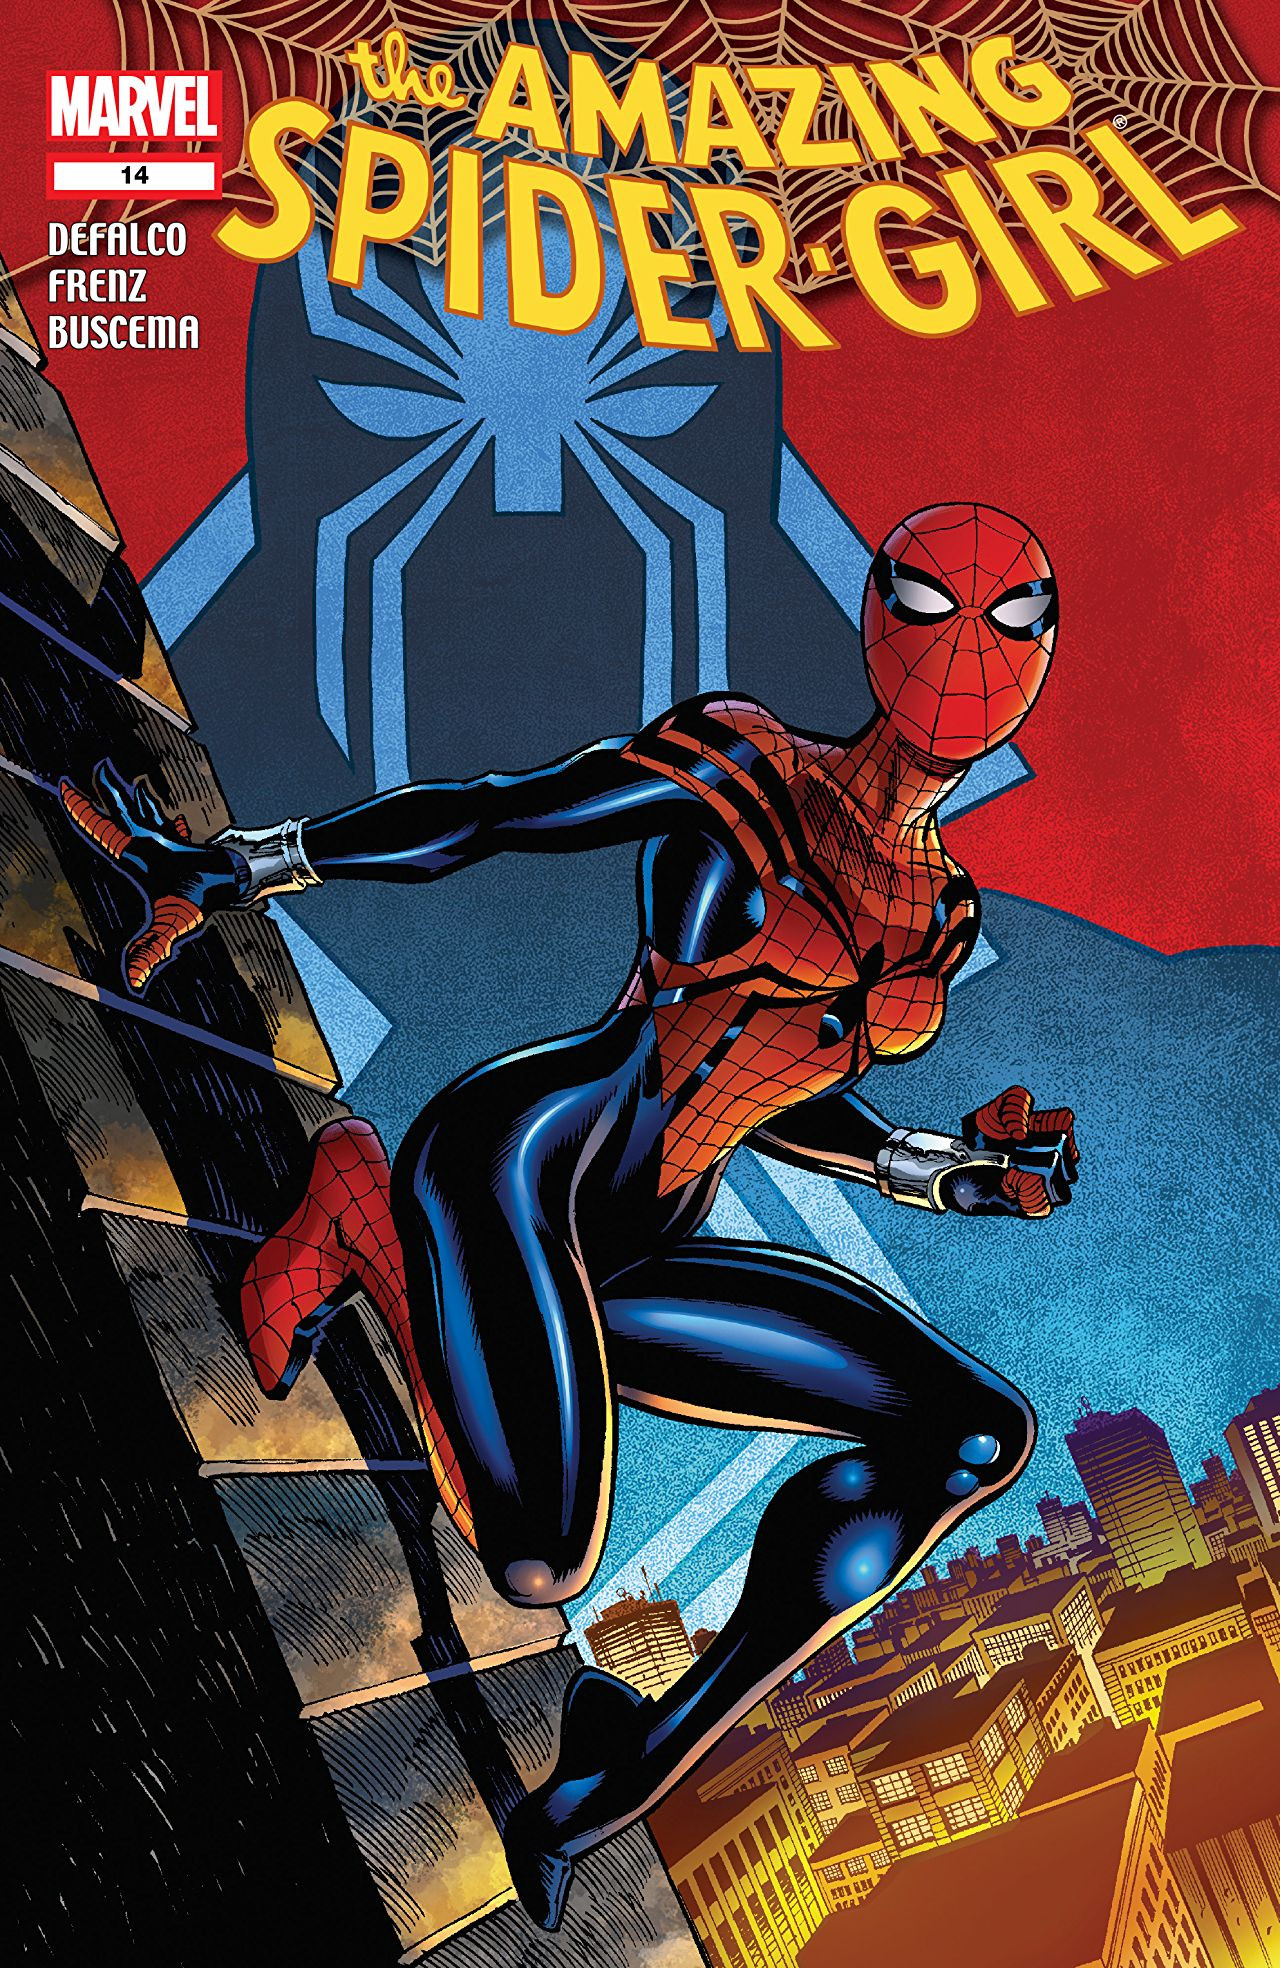 Amazing Spider-Girl Vol 1 14